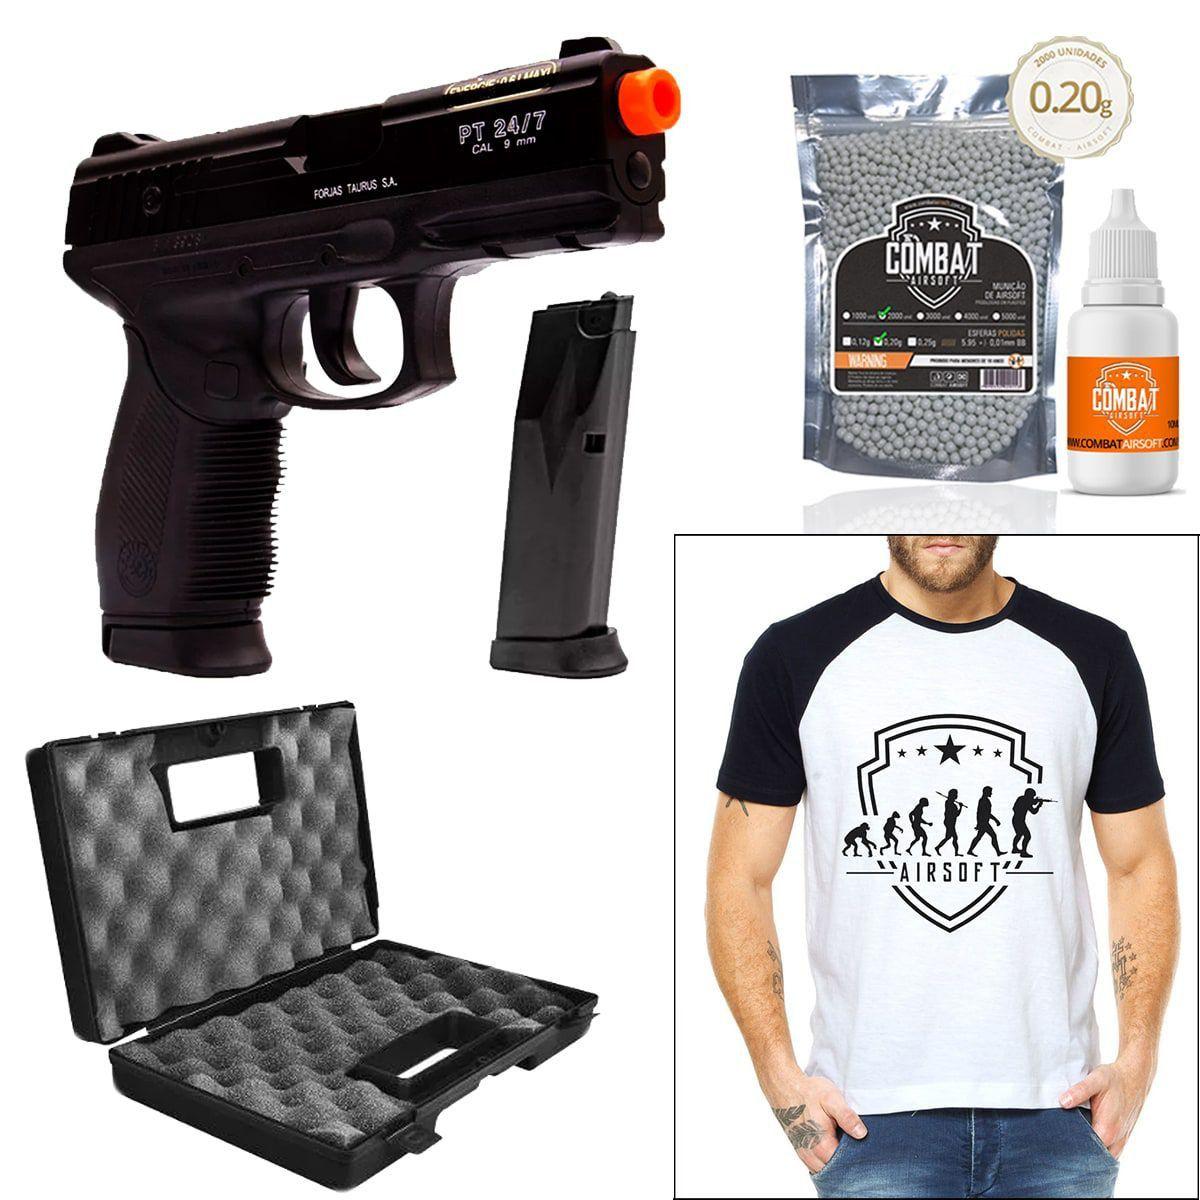 Pistola Airsoft Spring Cybergun PT24/7 Cybergun 6mm + Magazine Extra + Camiseta + Óleo + Case